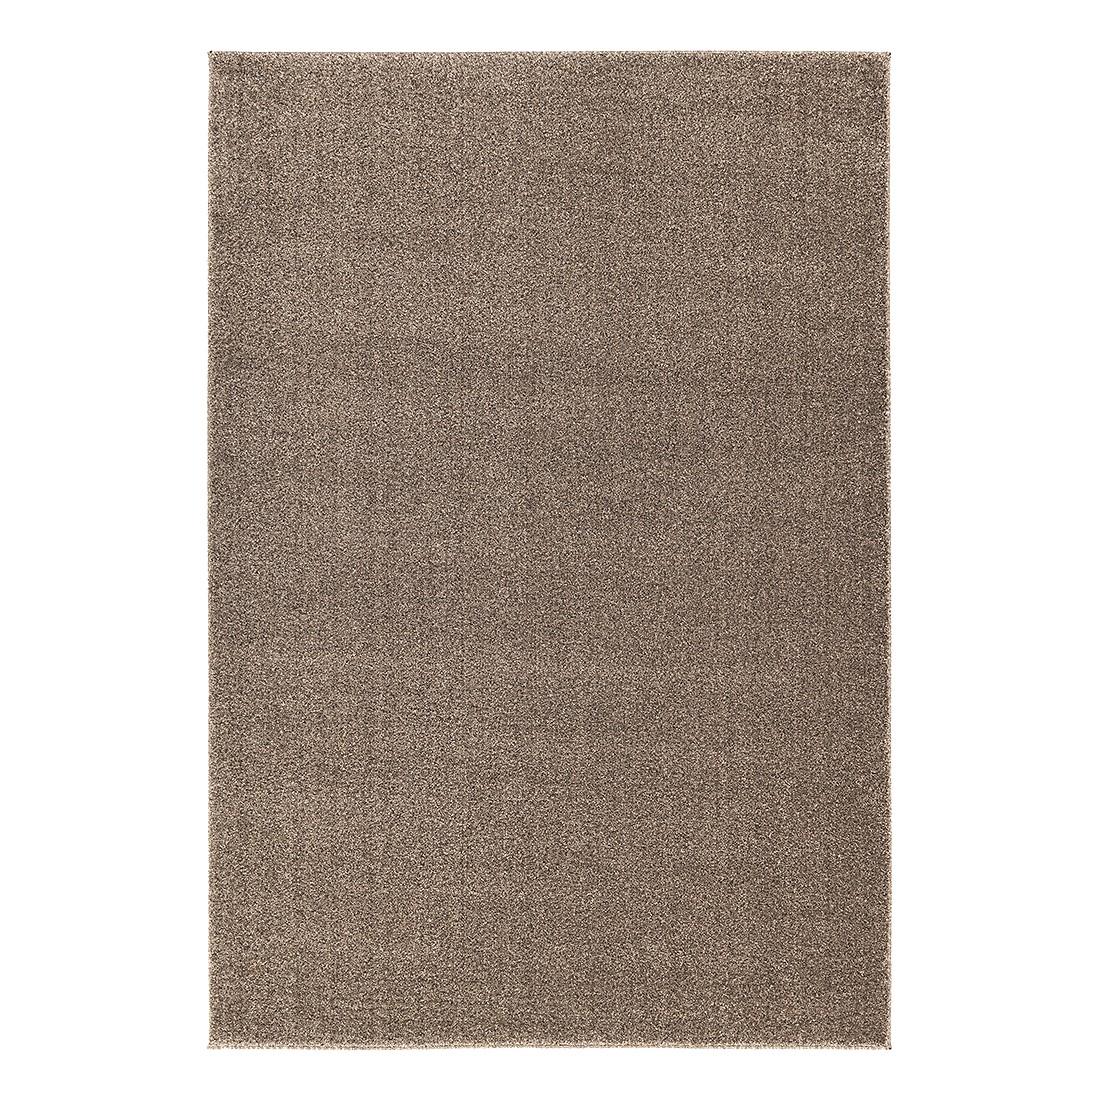 Teppich Samoa I - Erde - 80 x 150 cm, Astra